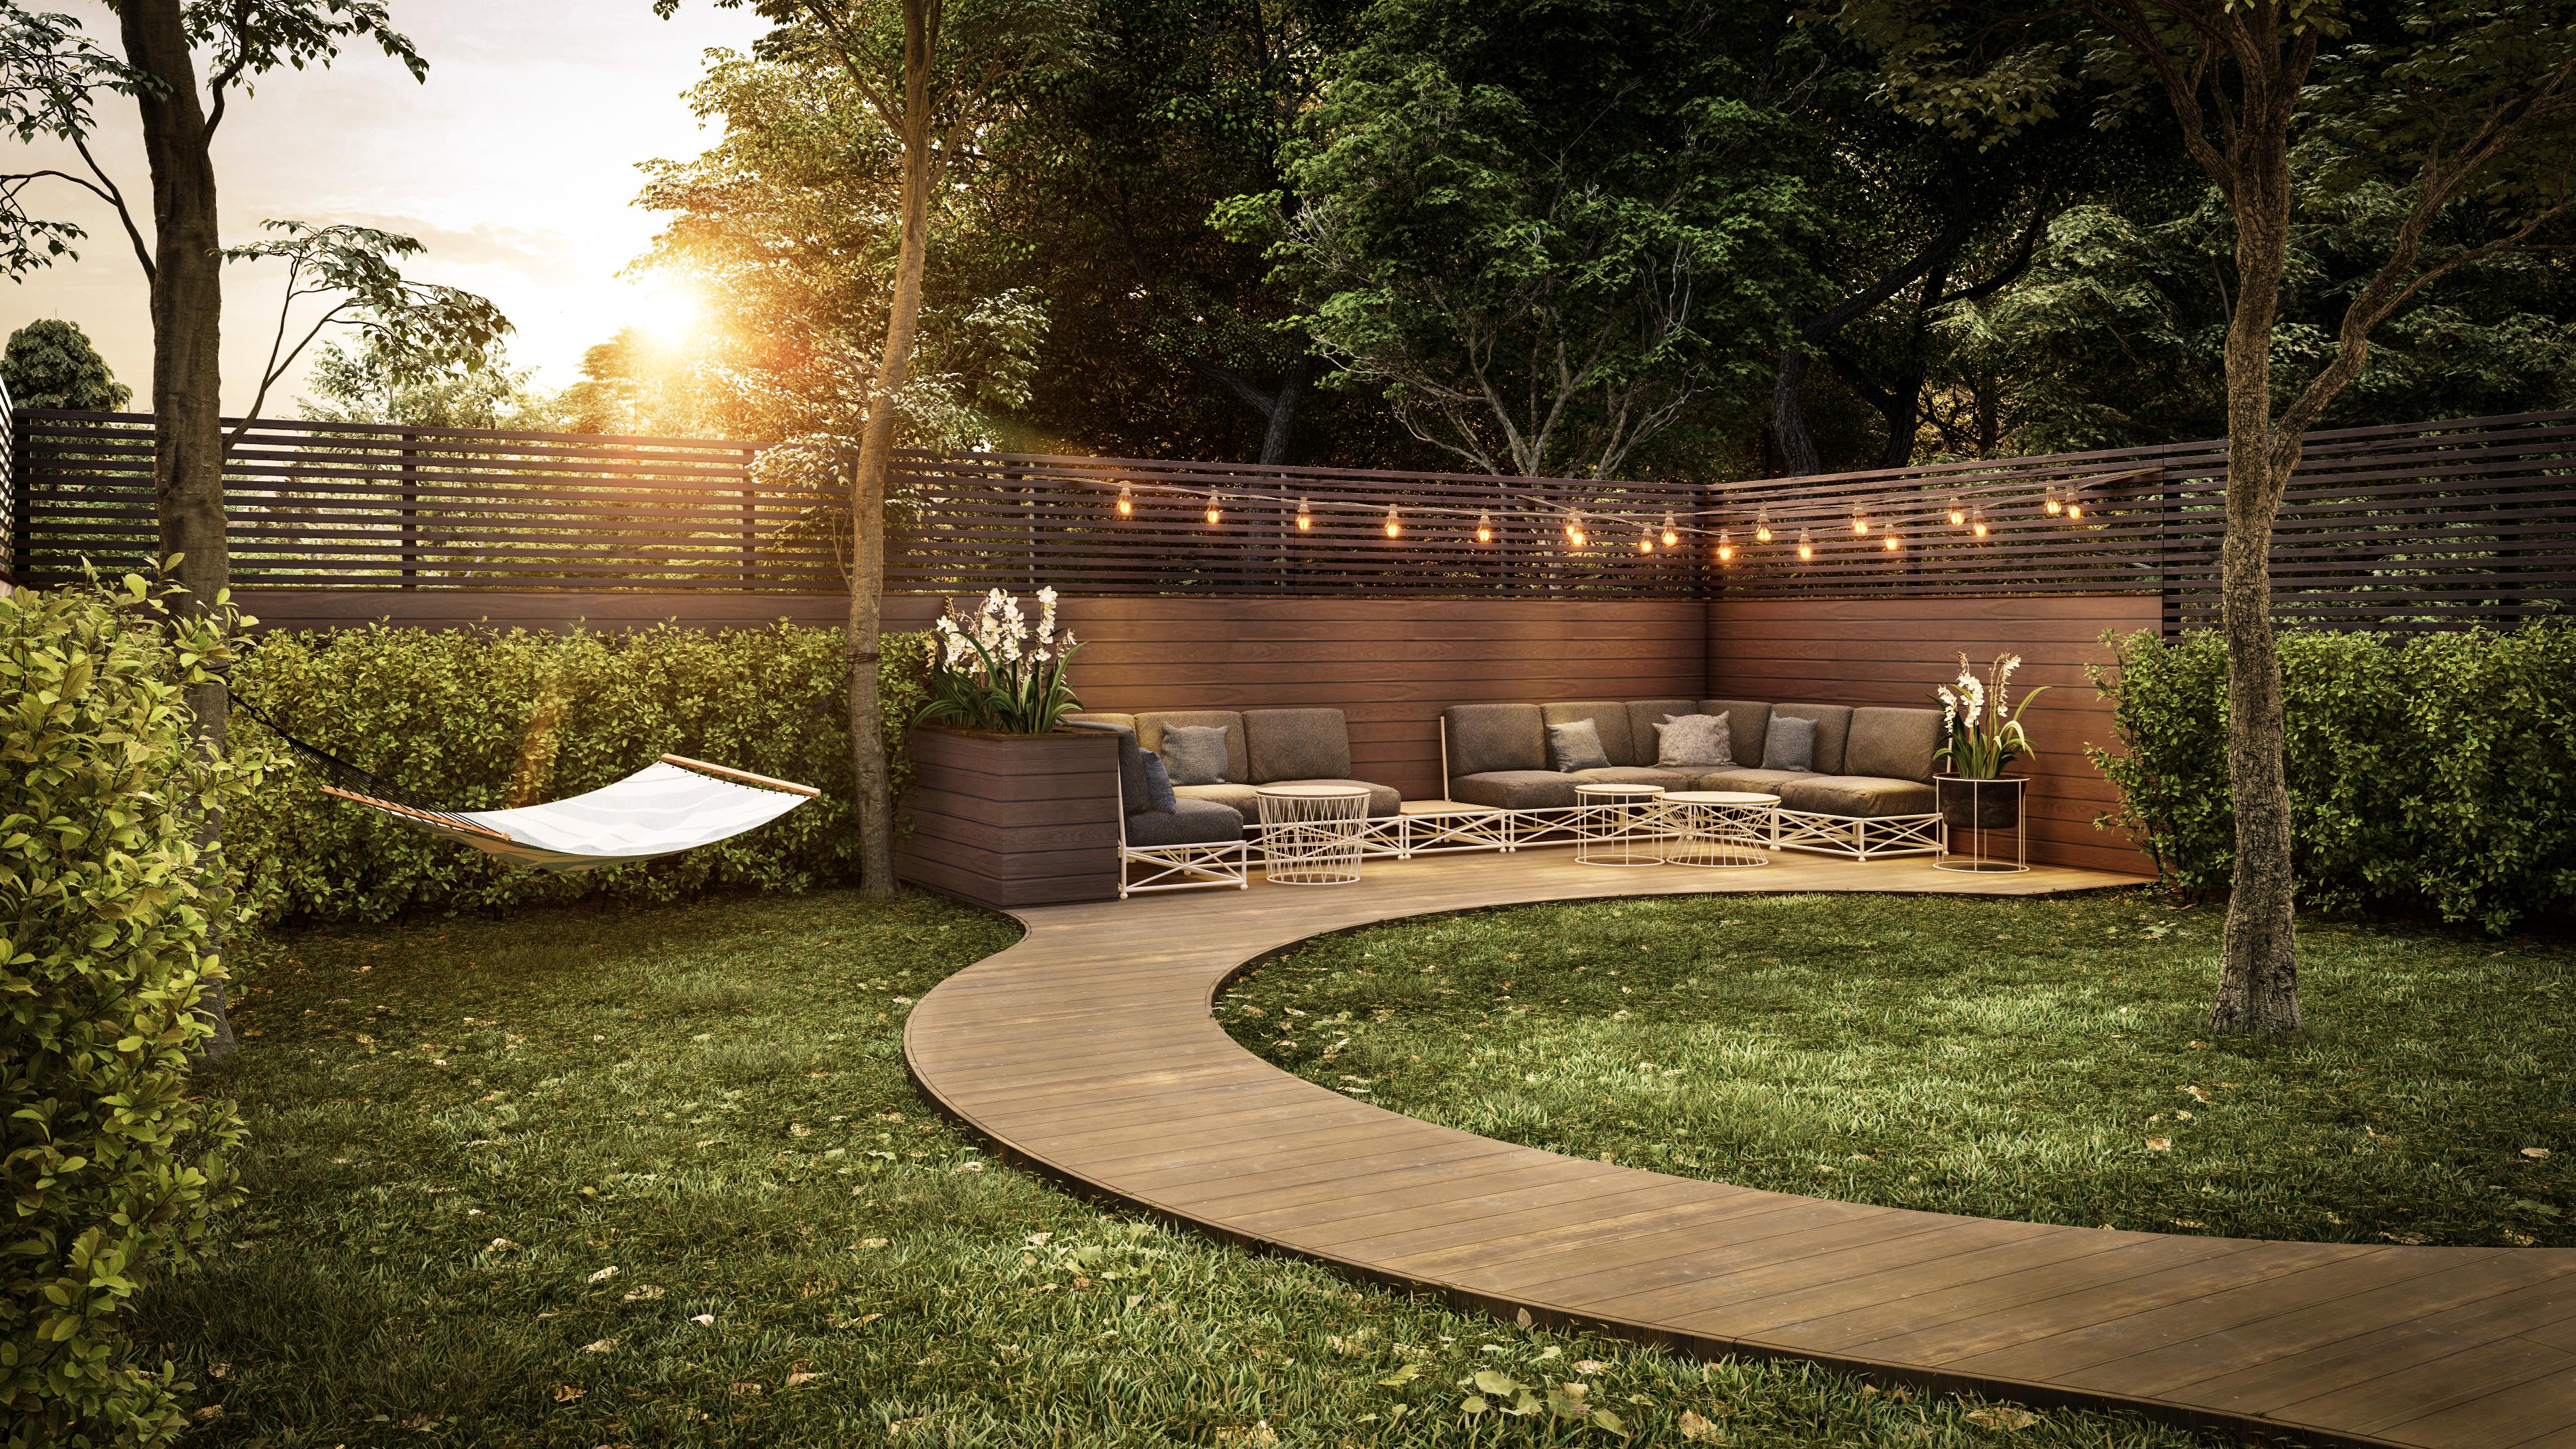 Backyard Garden Design Rendered In Lumion 10 By Stephan Pavlov Backyard Garden Design Backyard Landscaping Landscape Design Services